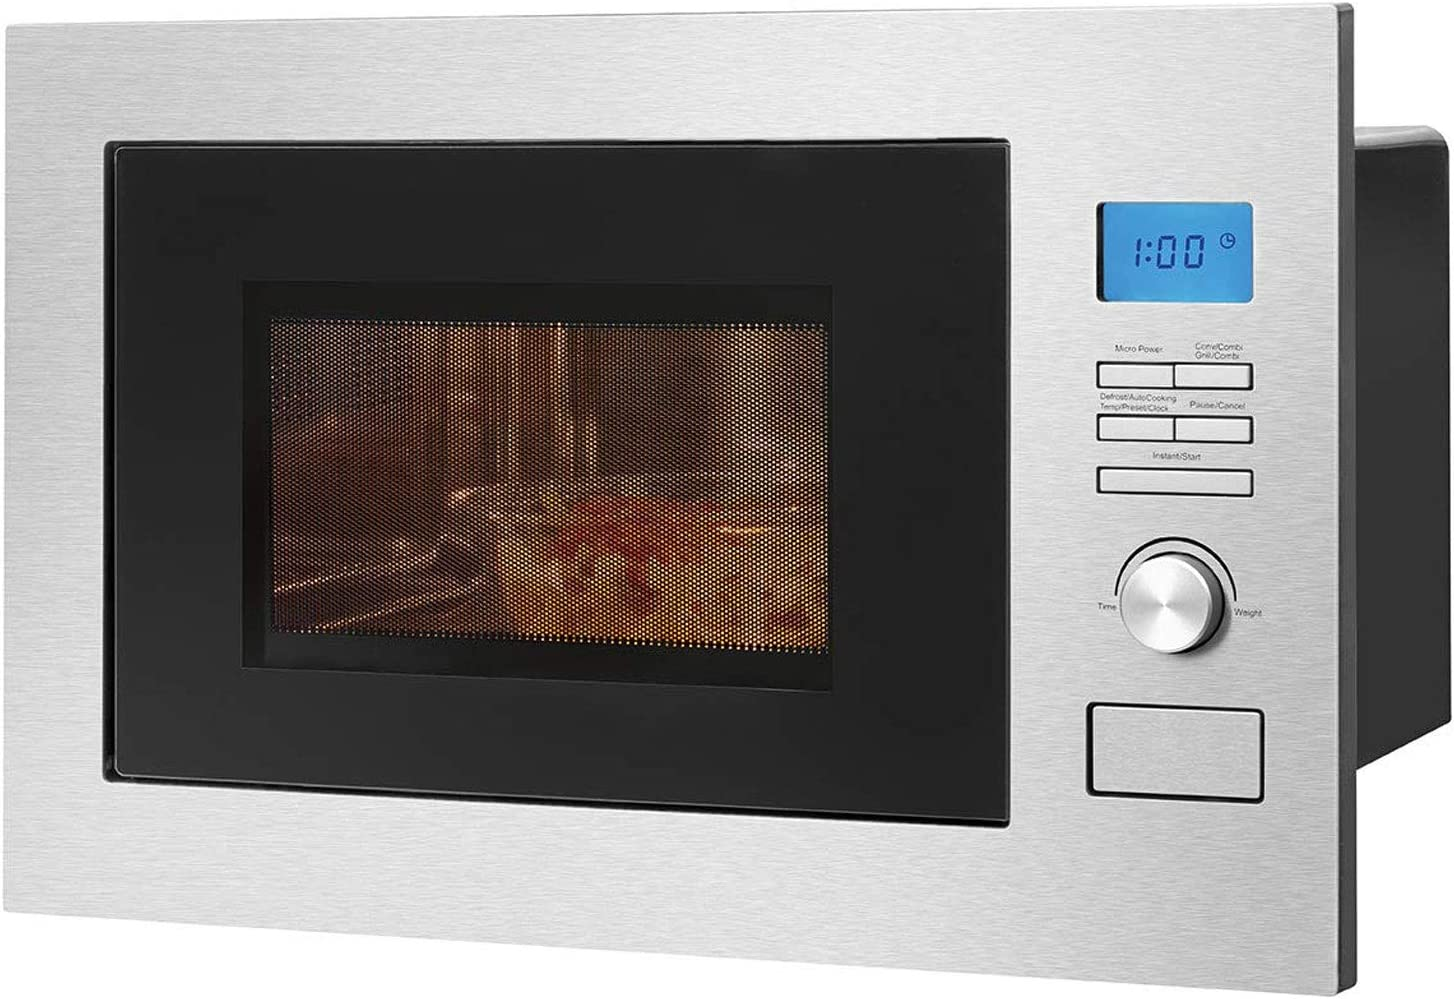 Bomann MWG 3001 H EB - Microondas 3 en 1 con grill y aire caliente, pantalla LCD, 8 programas automáticos, función de temporizador, 25 L de espacio de cocción, frontal e interior de acero inoxidable